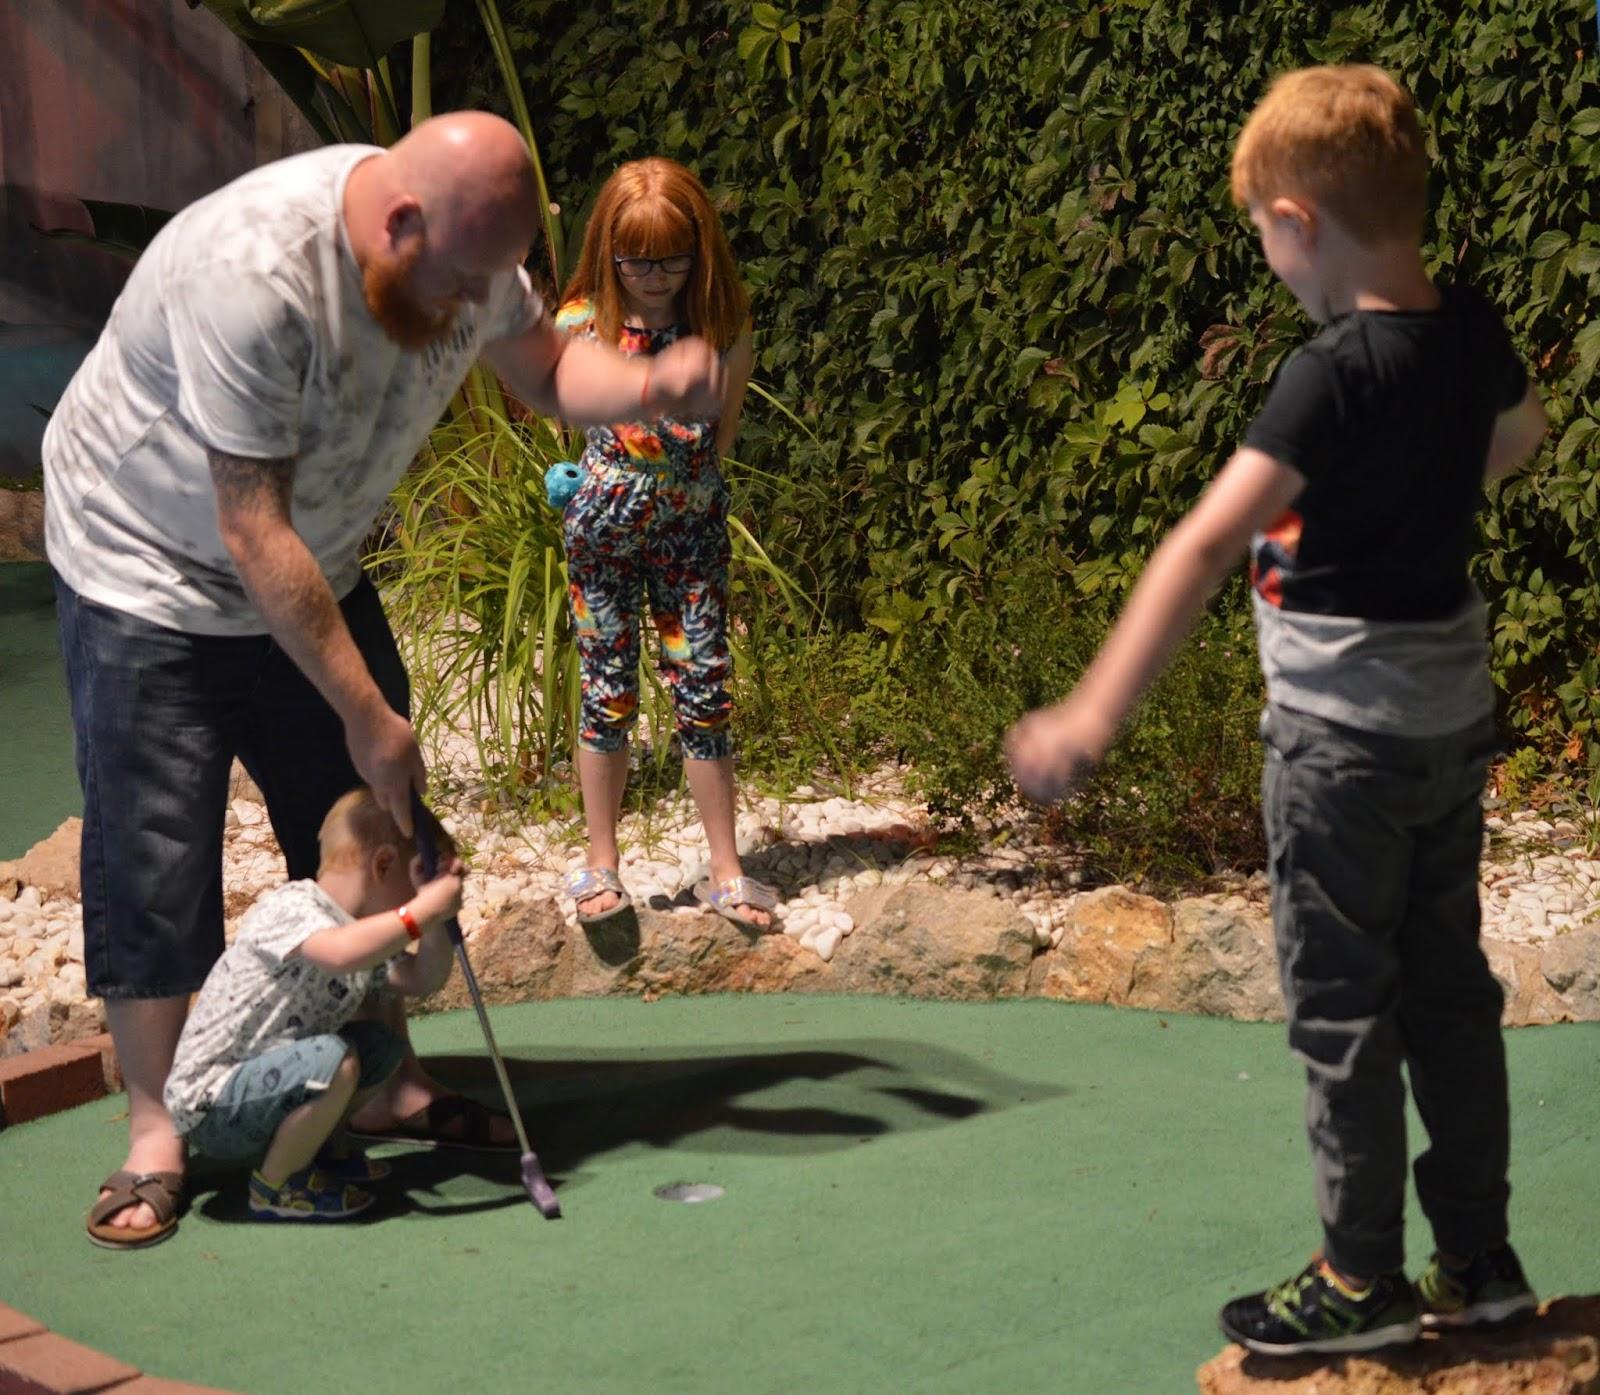 Pirates Village Santa Ponsa | Jet 2 Holidays Review  - crazy golf Santa Ponsa